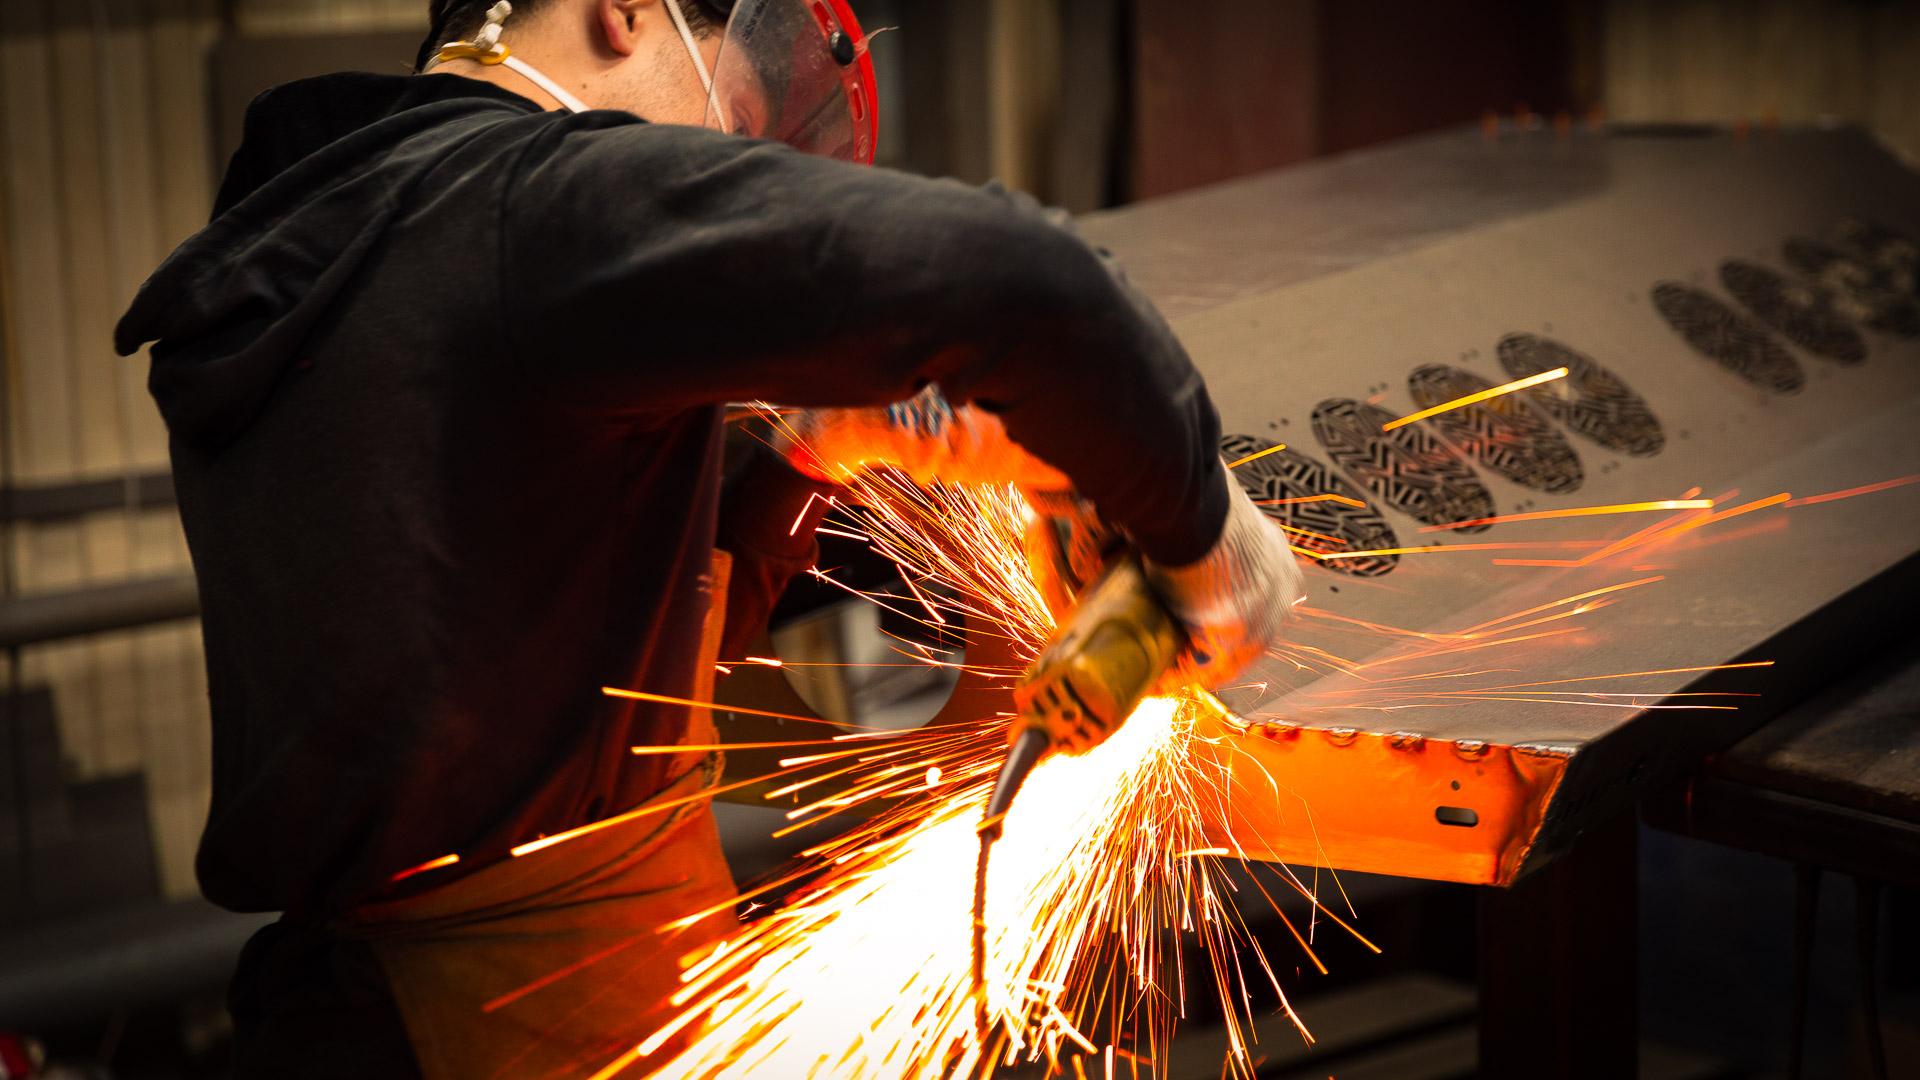 Perfolux metal fabrication, Metal Grinding Operations